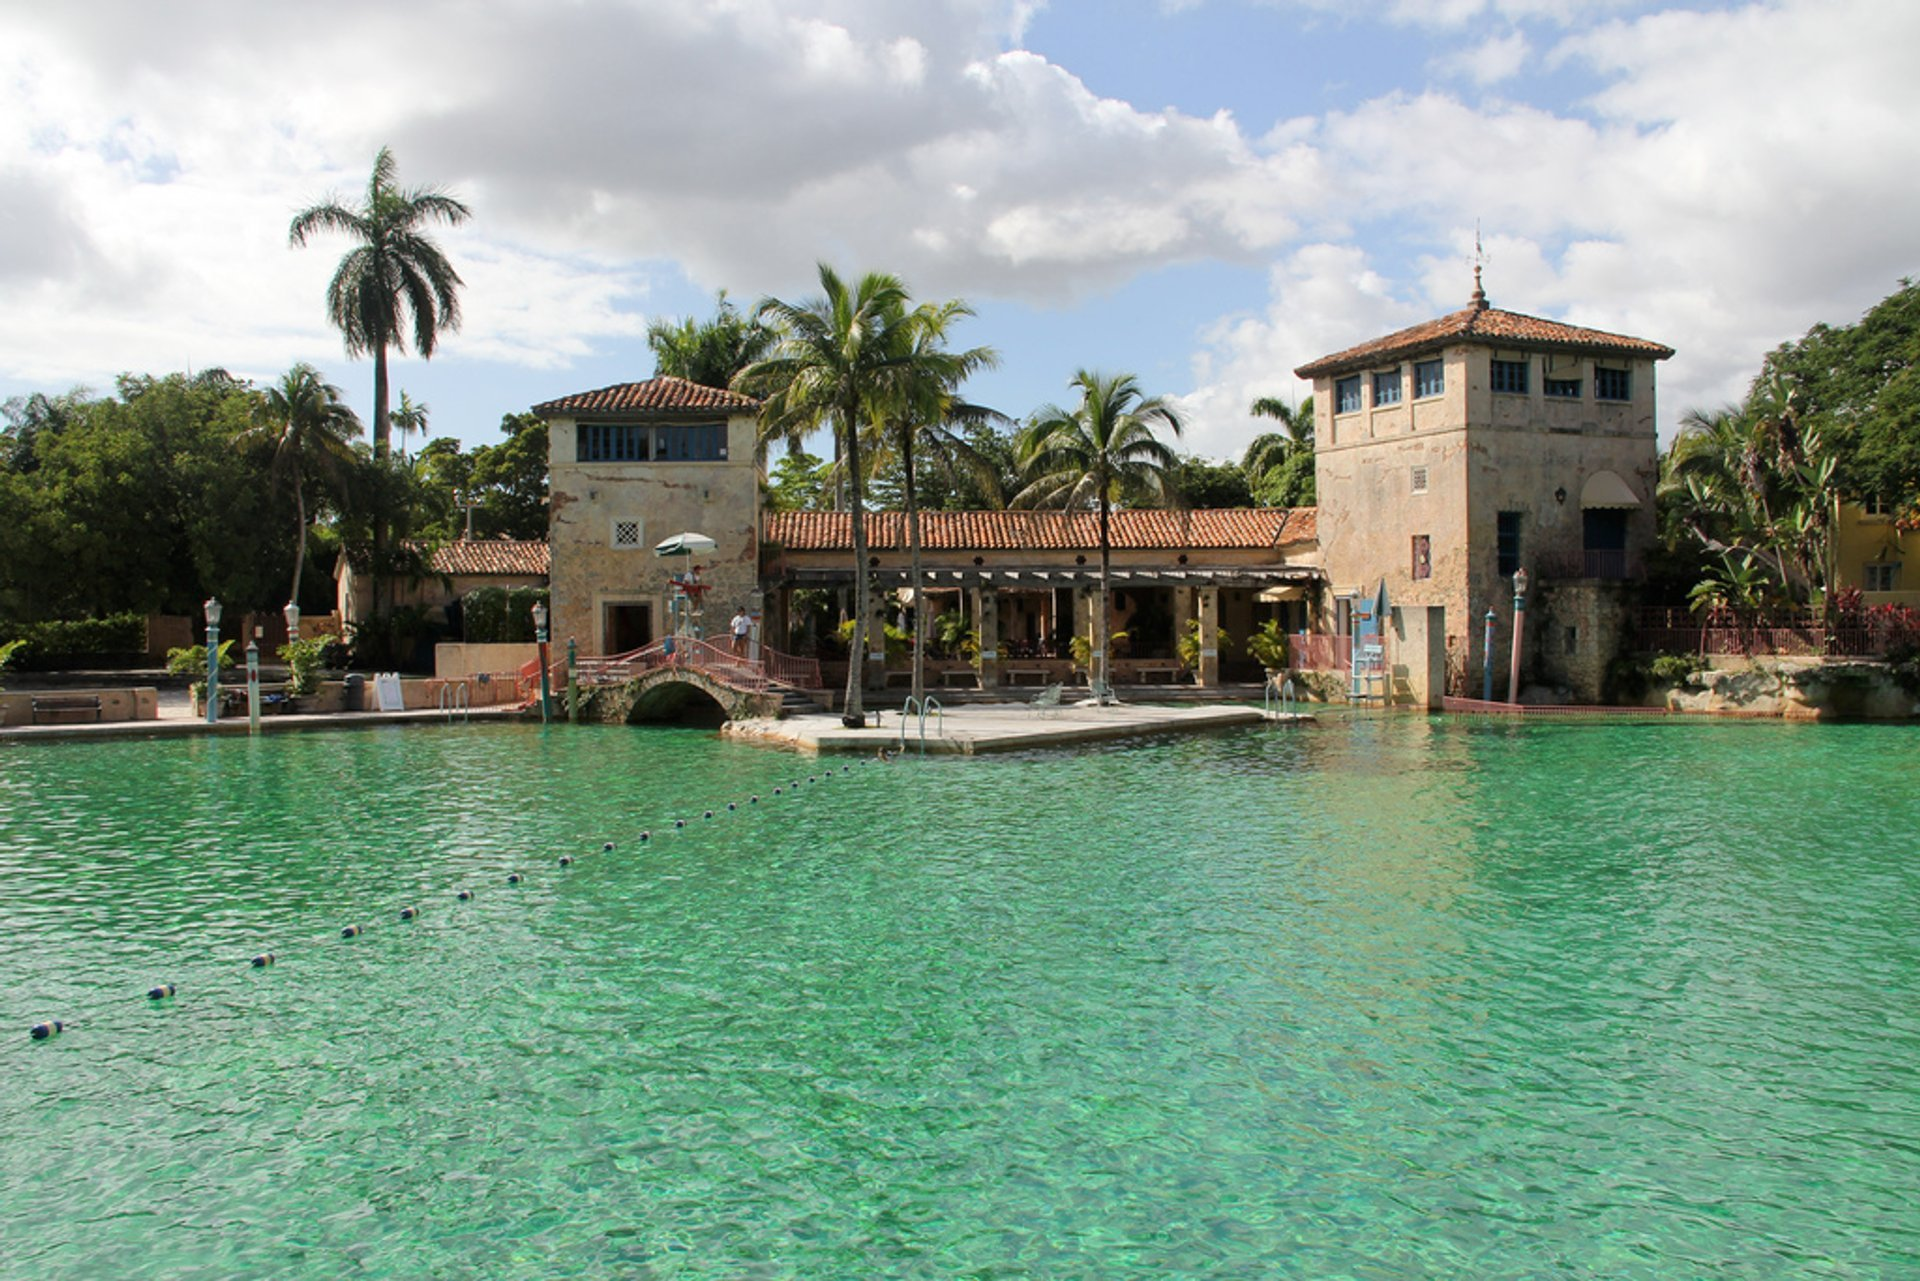 Venetian Pool, Coral Gables in Florida - Best Season 2019